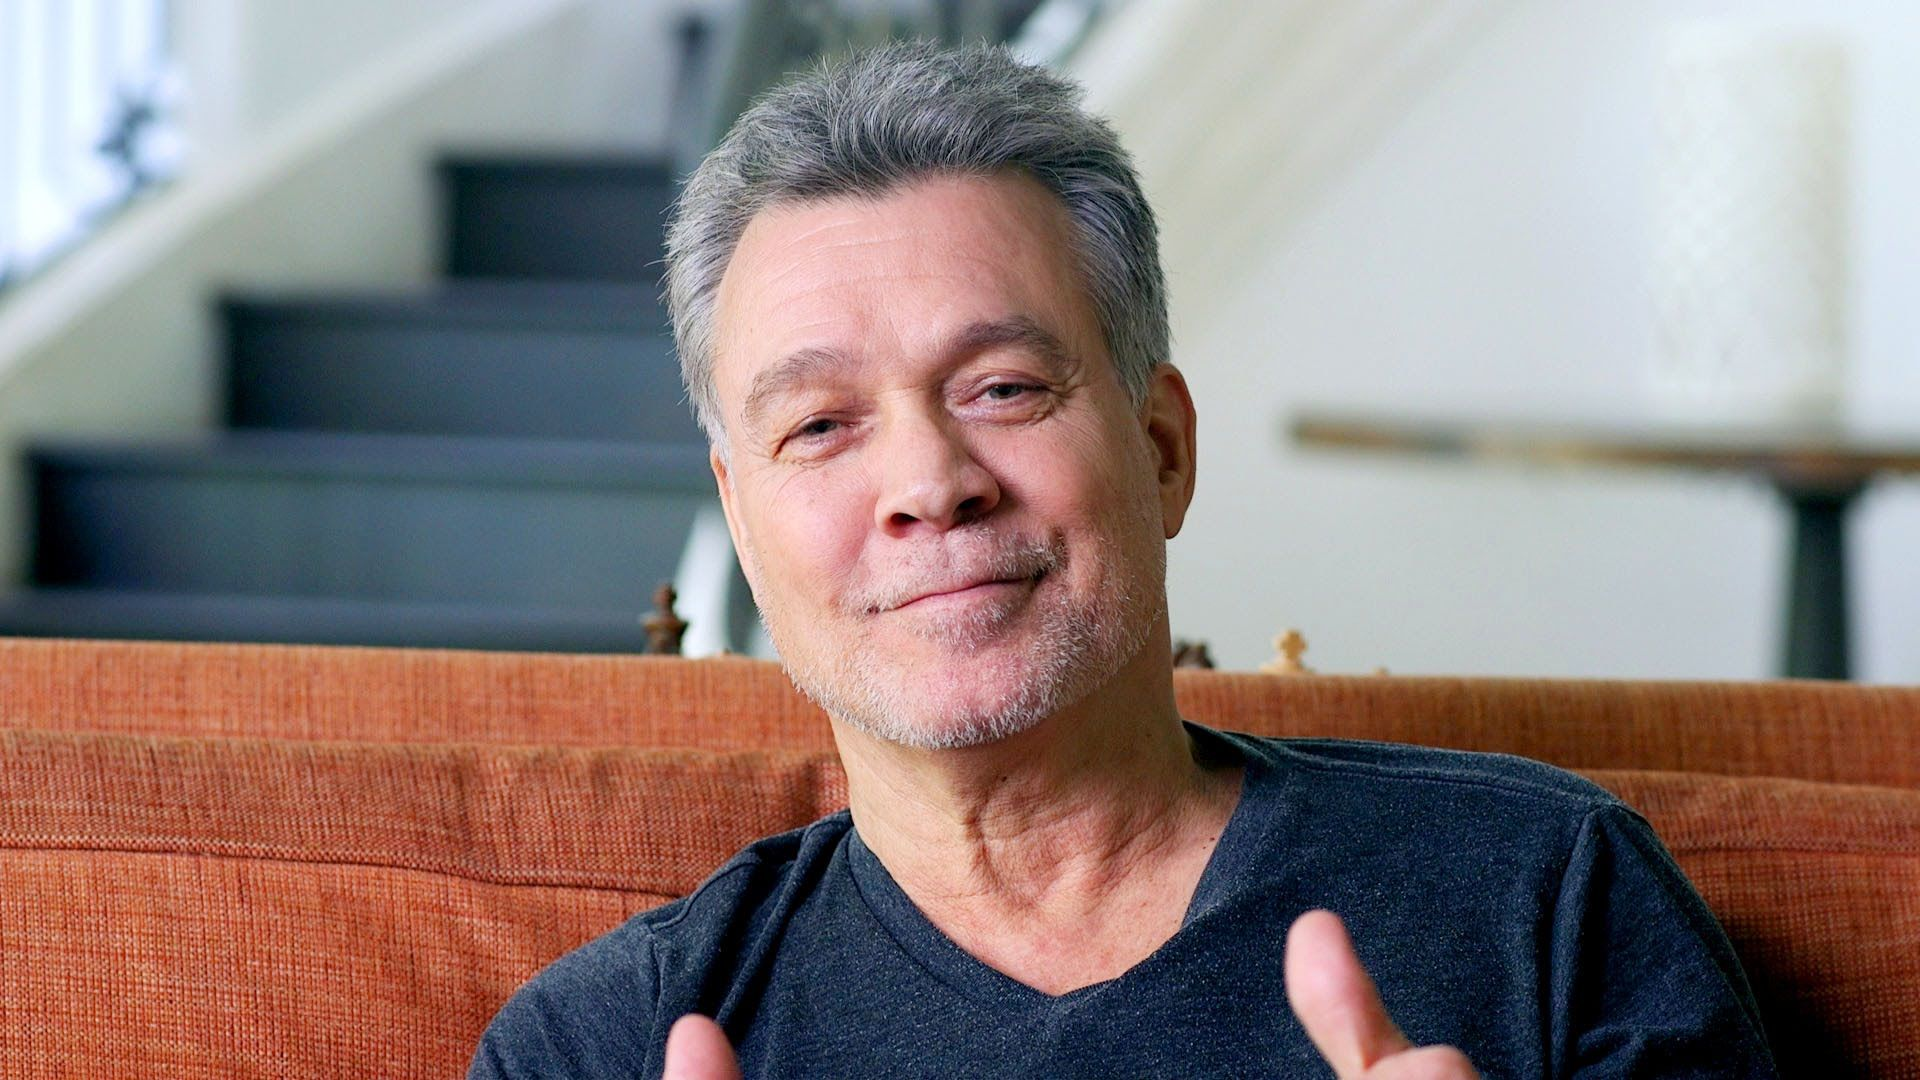 Eddie Van Halen On How He Switched From Kid Classical Pianist To Shreddi With Images Eddie Van Halen Van Halen Pianist